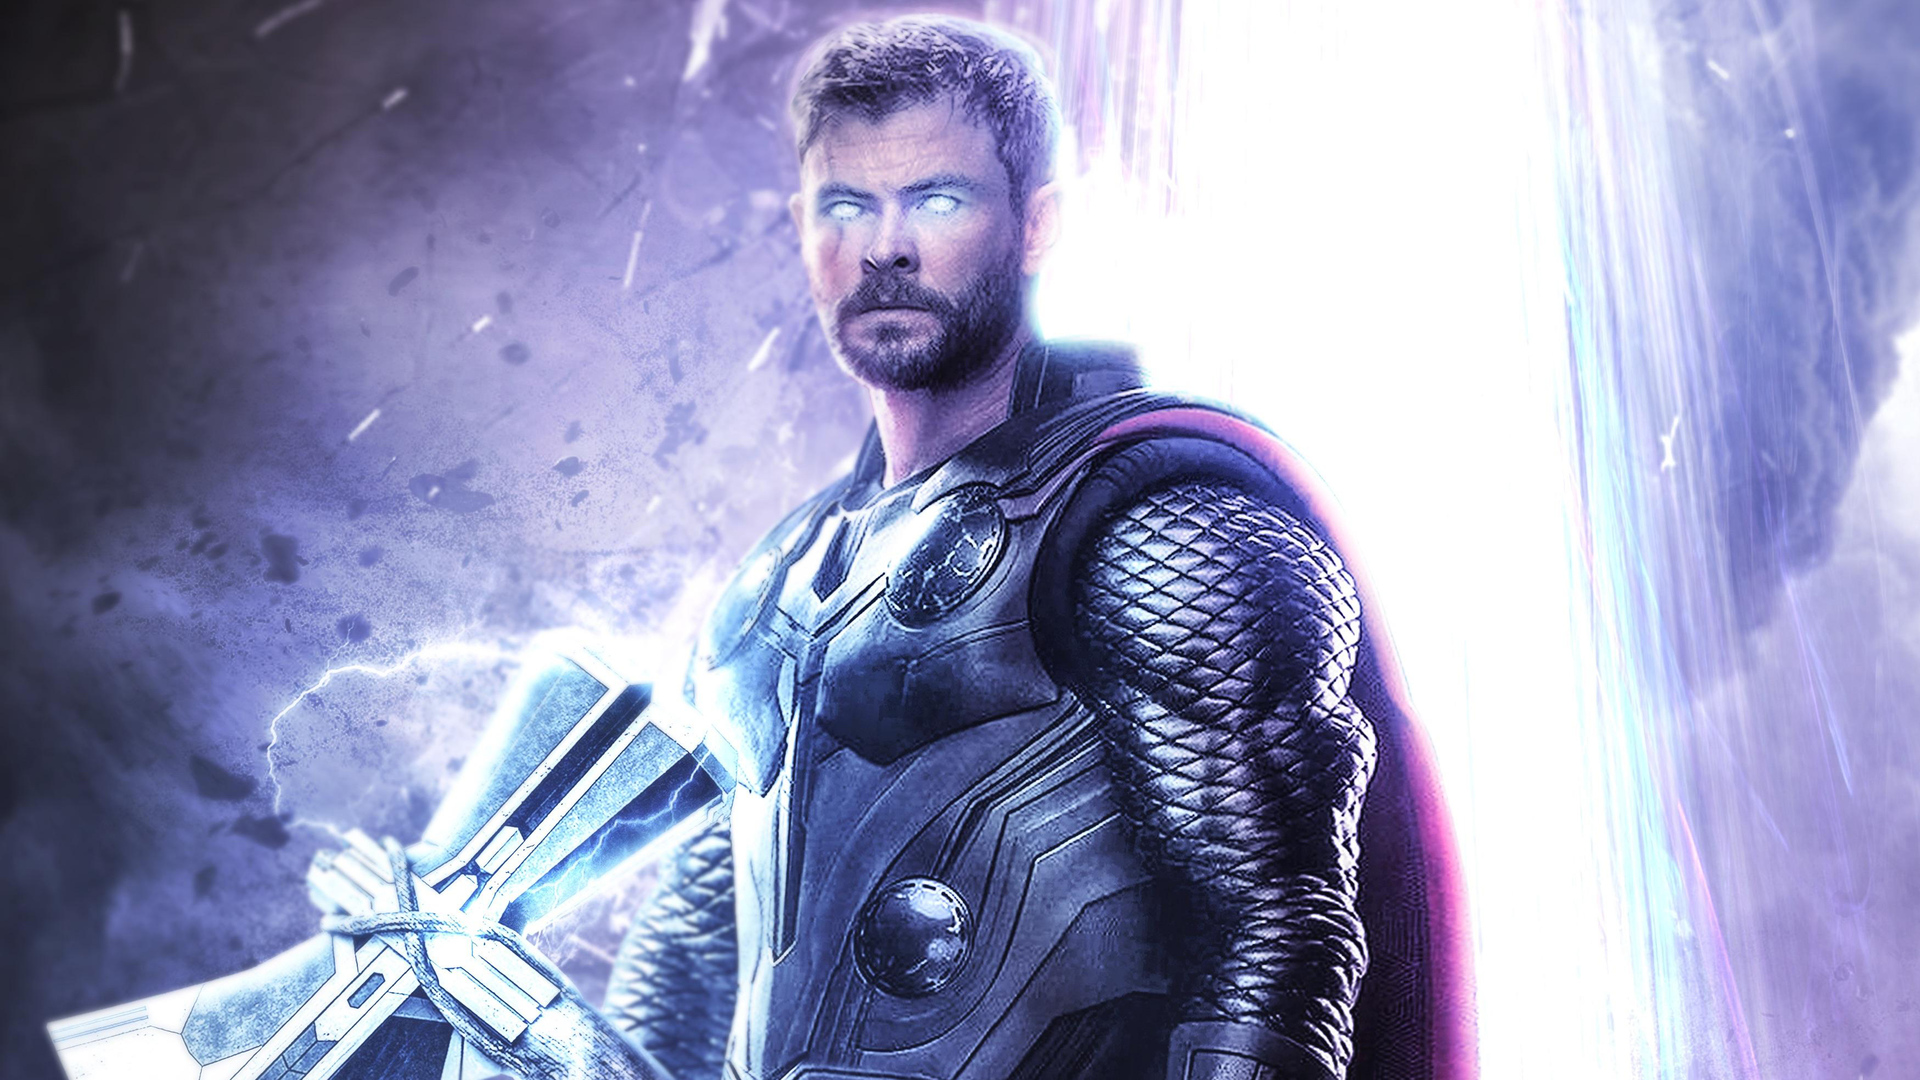 1920x1080 Thor Avengers Endgame Laptop Full HD 1080P HD 4k ...